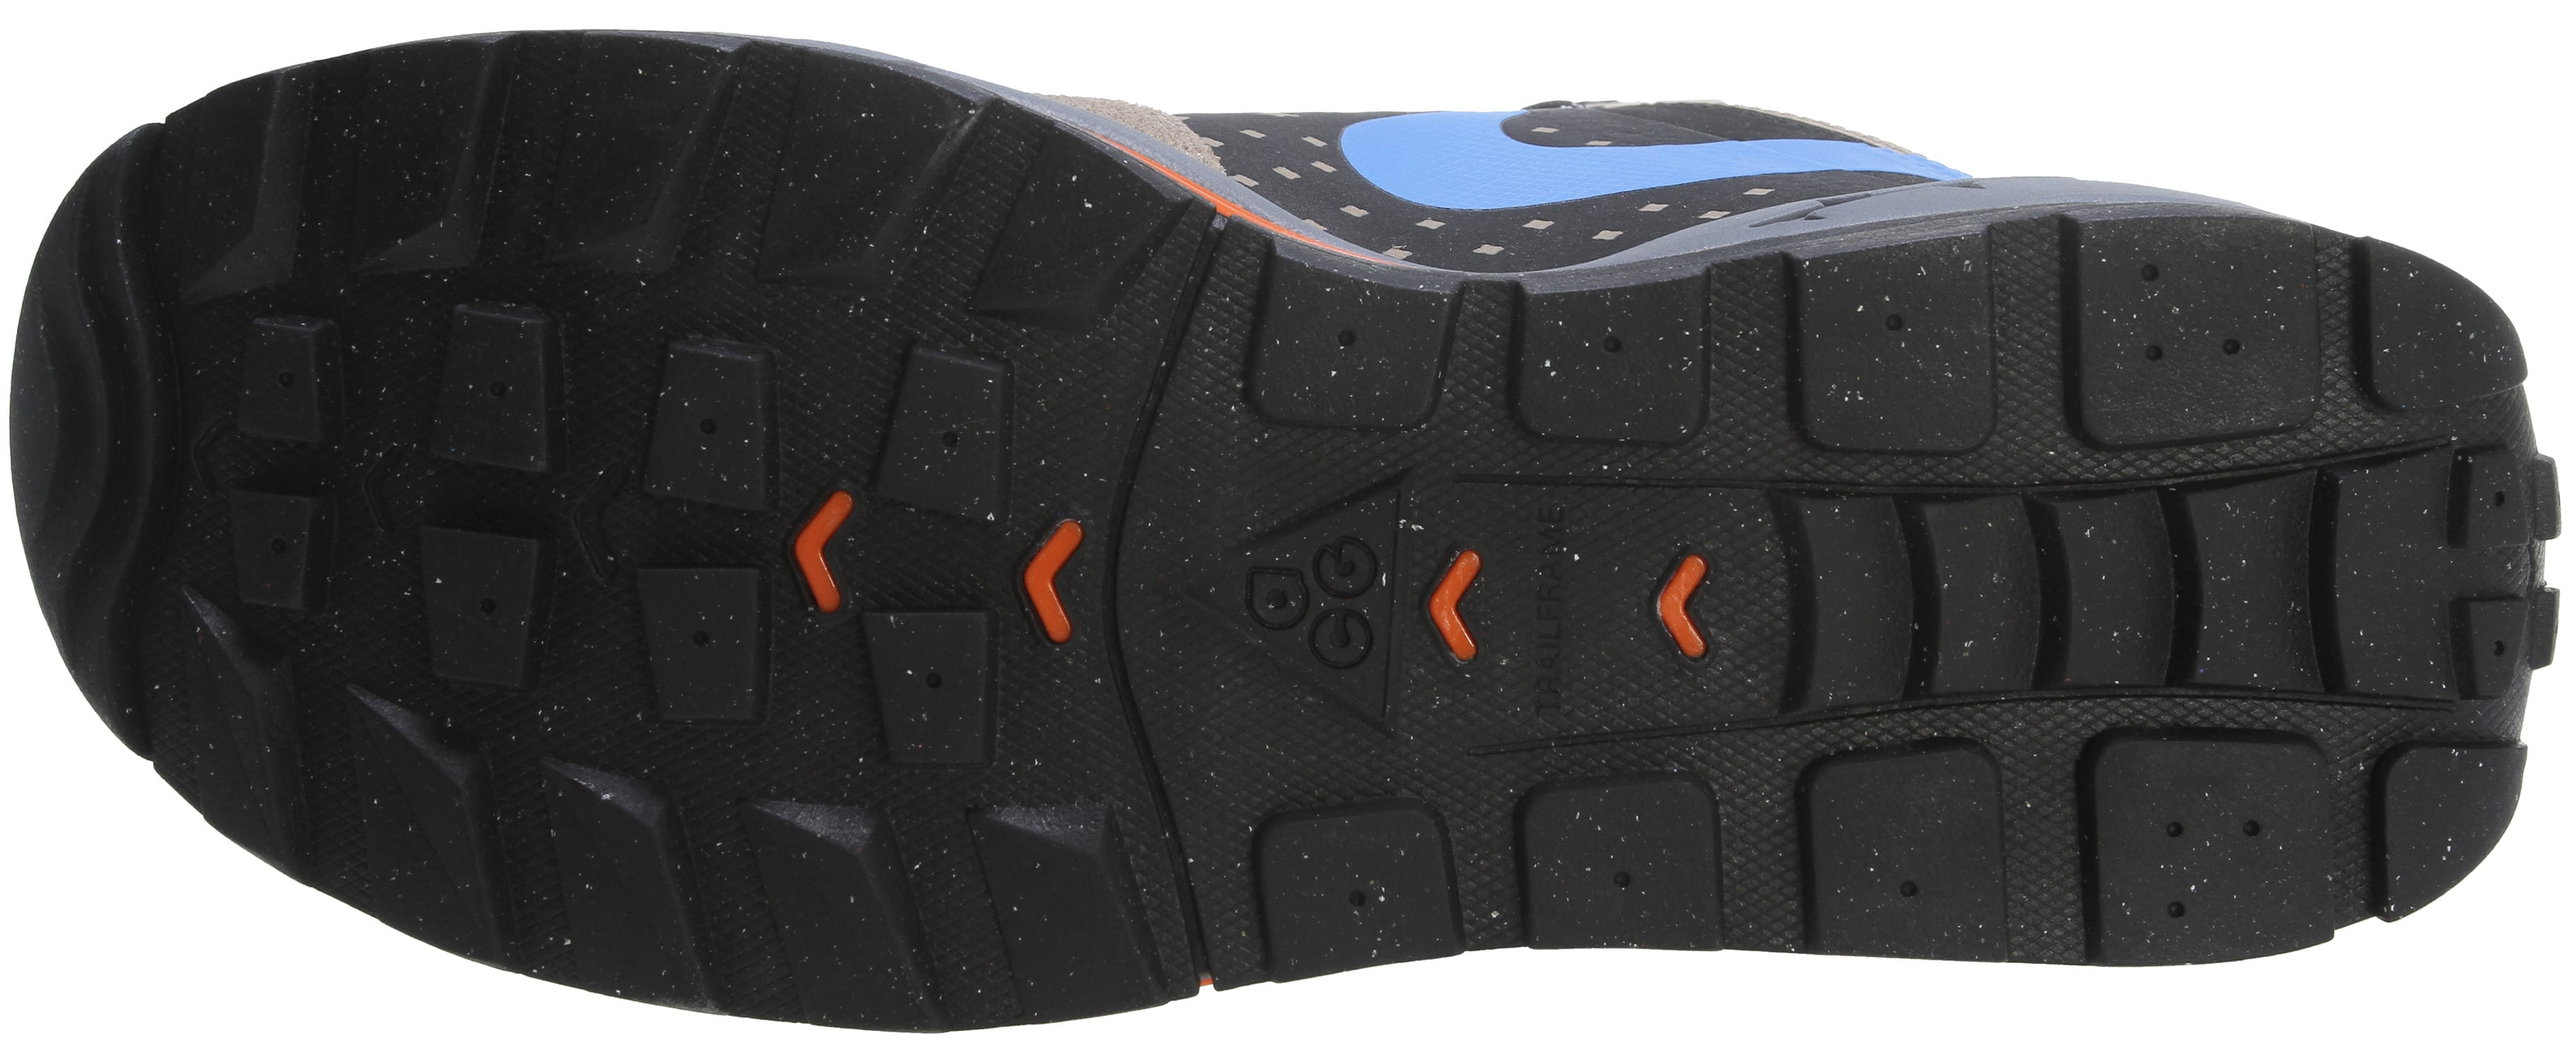 7456e4e7f851 Nike Air Alder Mid Hiking Boots - thumbnail 4